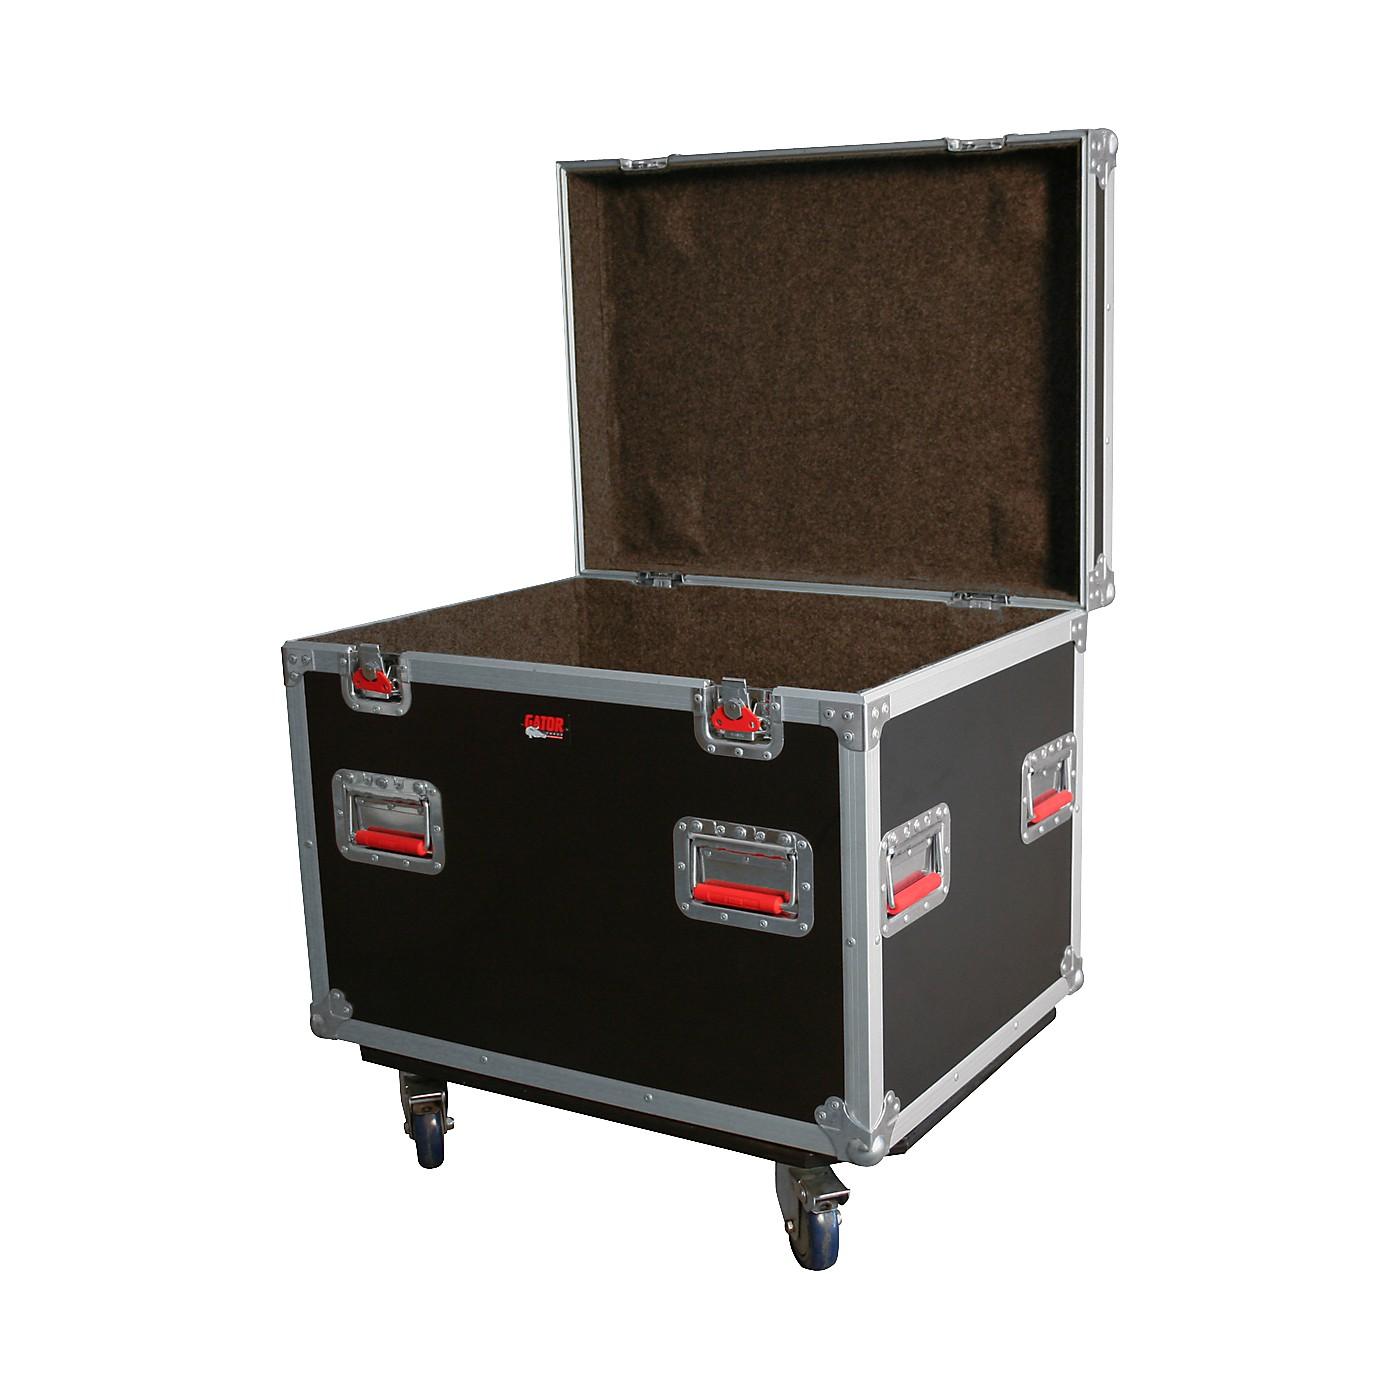 Gator G-TOUR-TRK 4530 HS Truck Pack Trunk thumbnail